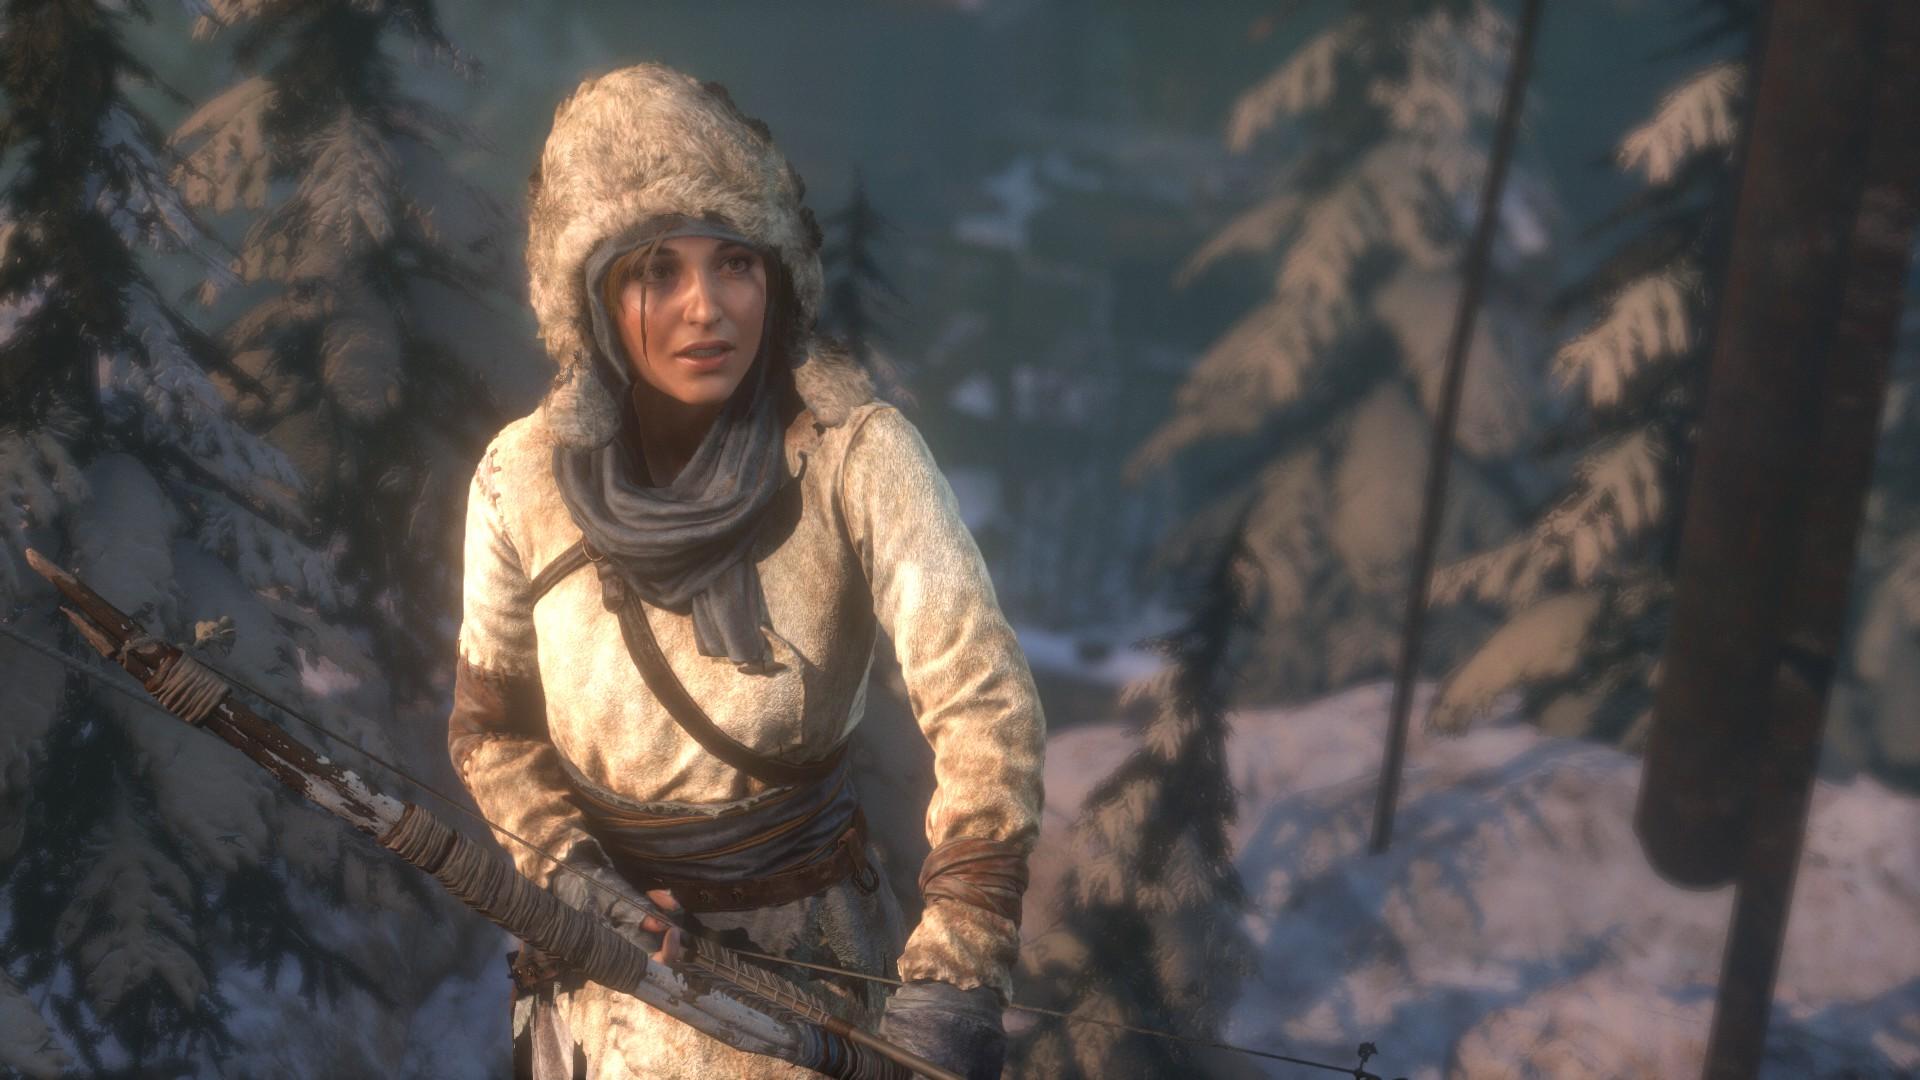 General 1920x1080 Rise of the Tomb Raider Lara Croft screen shot video games